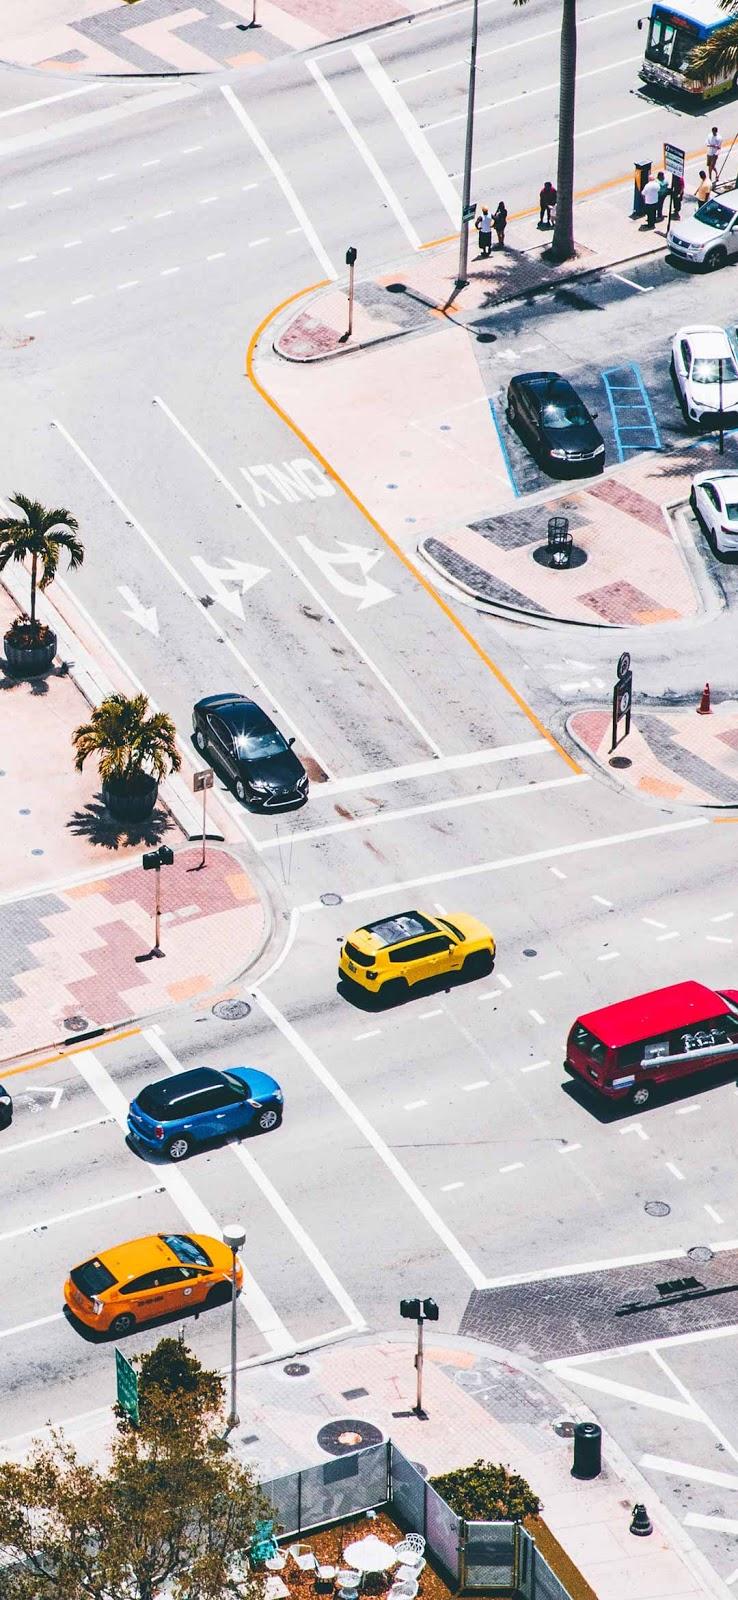 Street aerial view in summer